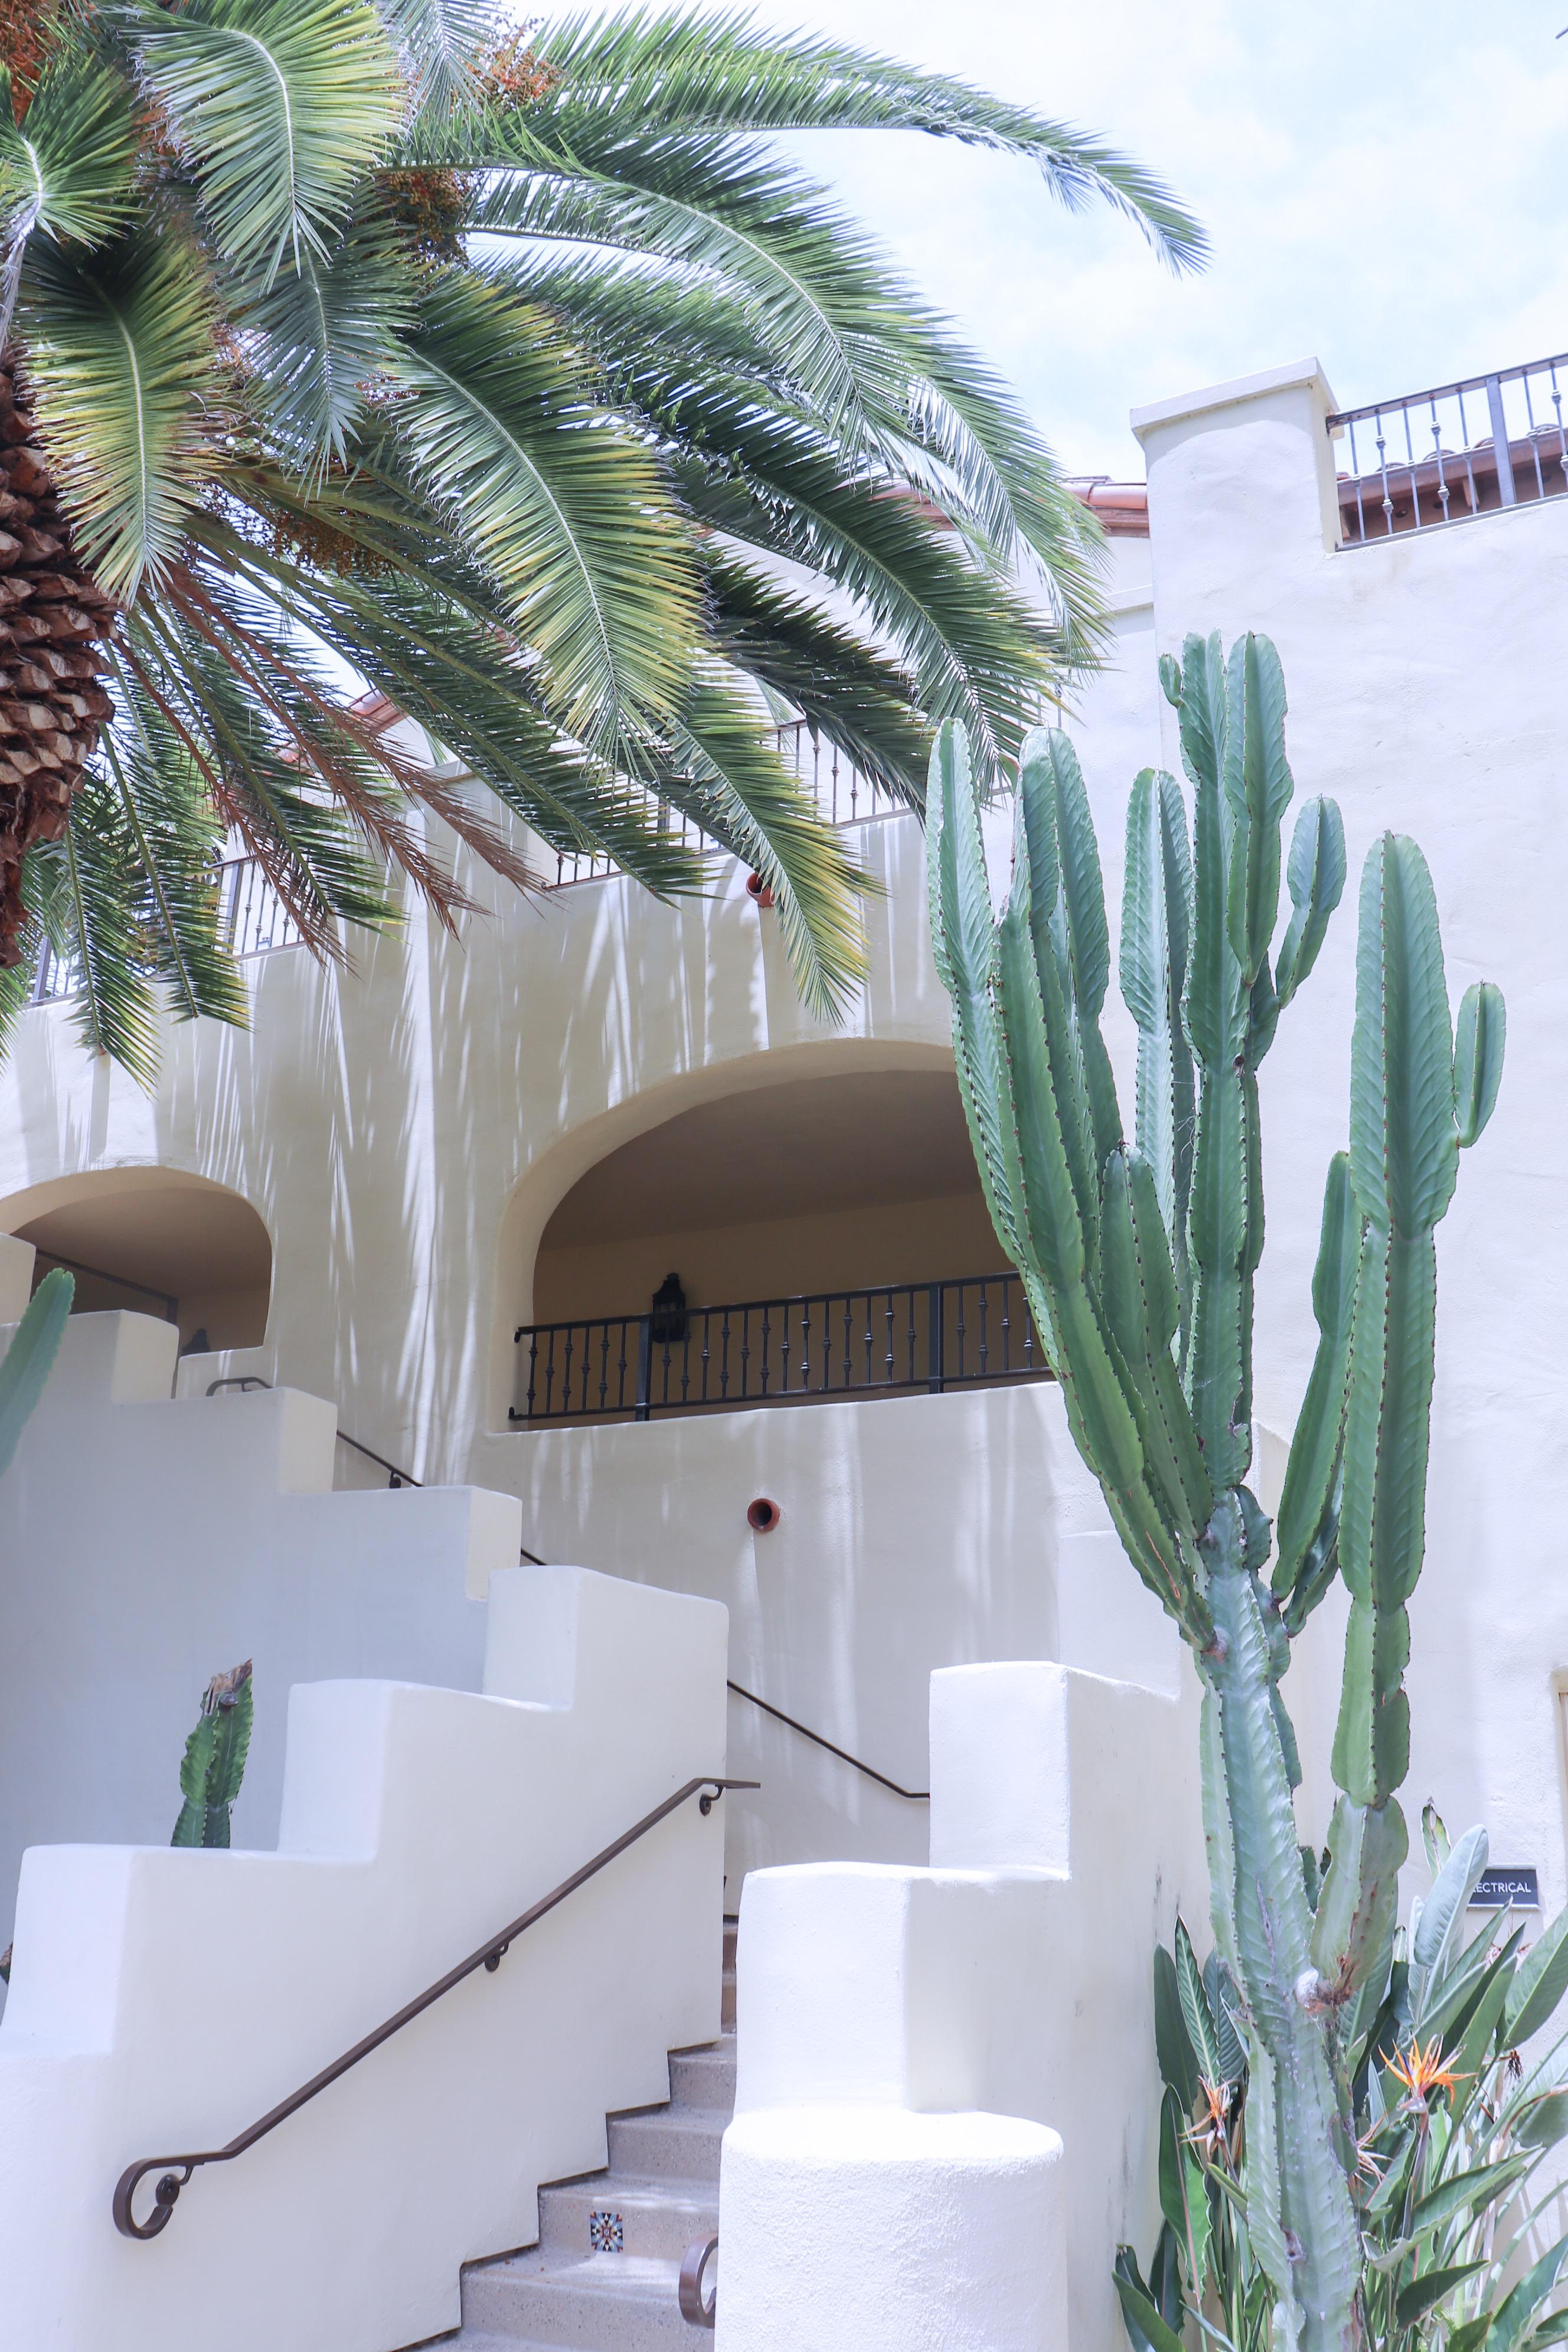 Travel: R& R at Estancia La Jolla